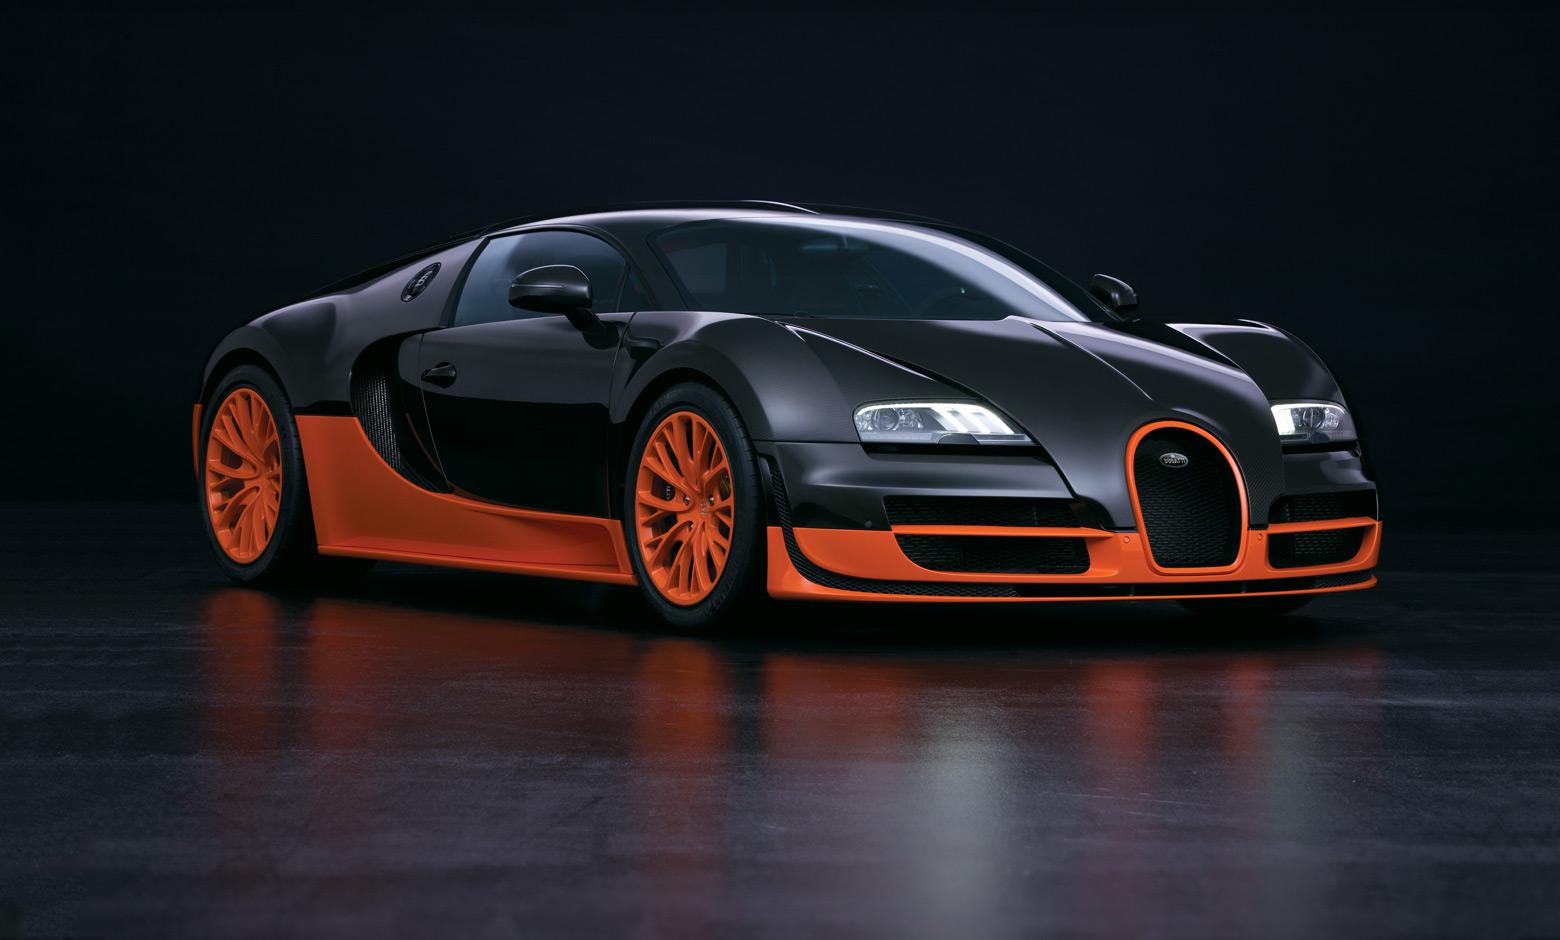 Bugatti Veyron High Quality Background on Wallpapers Vista